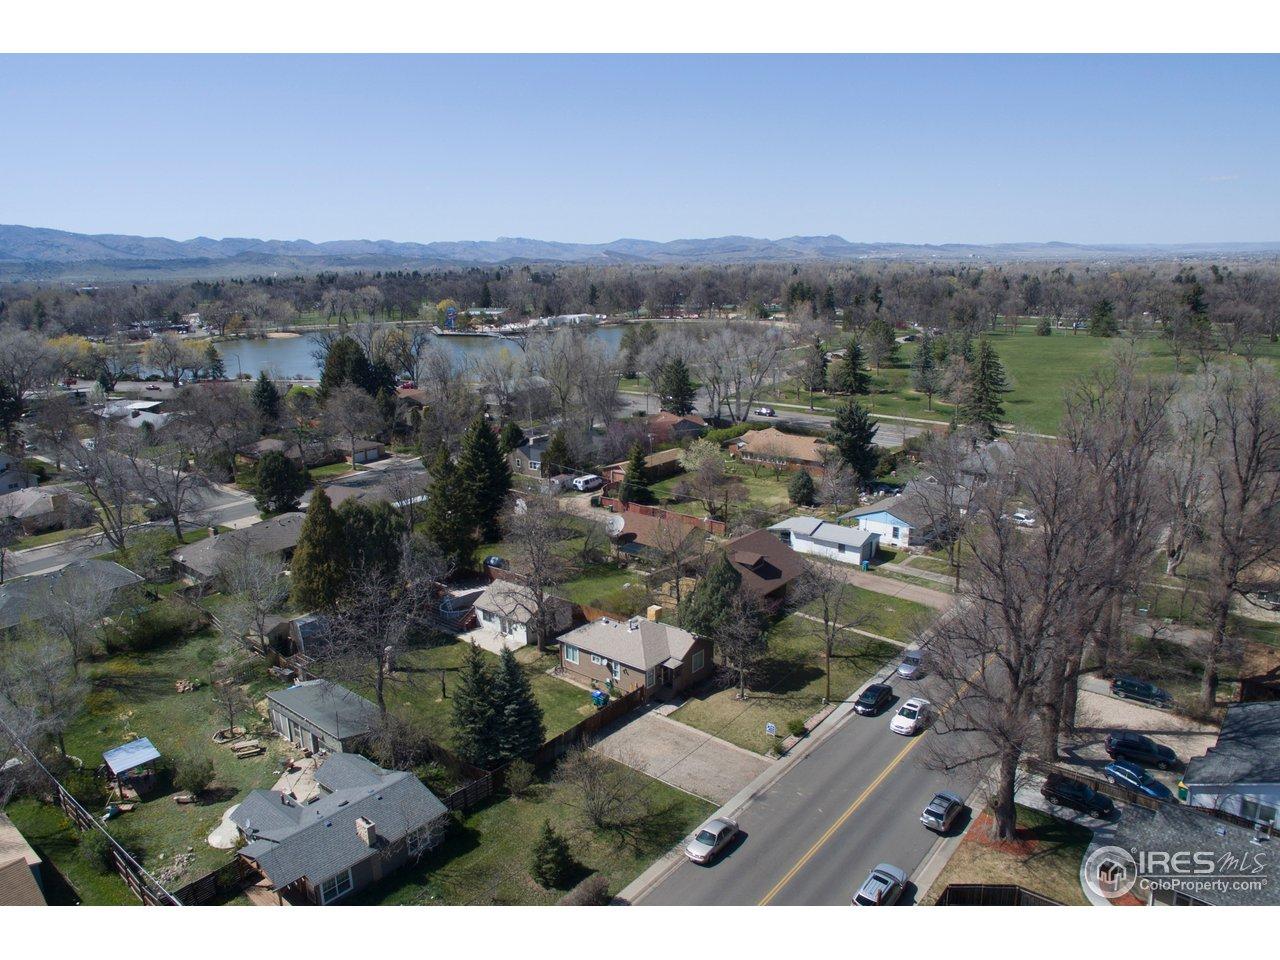 525 City Park Ave, Fort Collins CO 80521